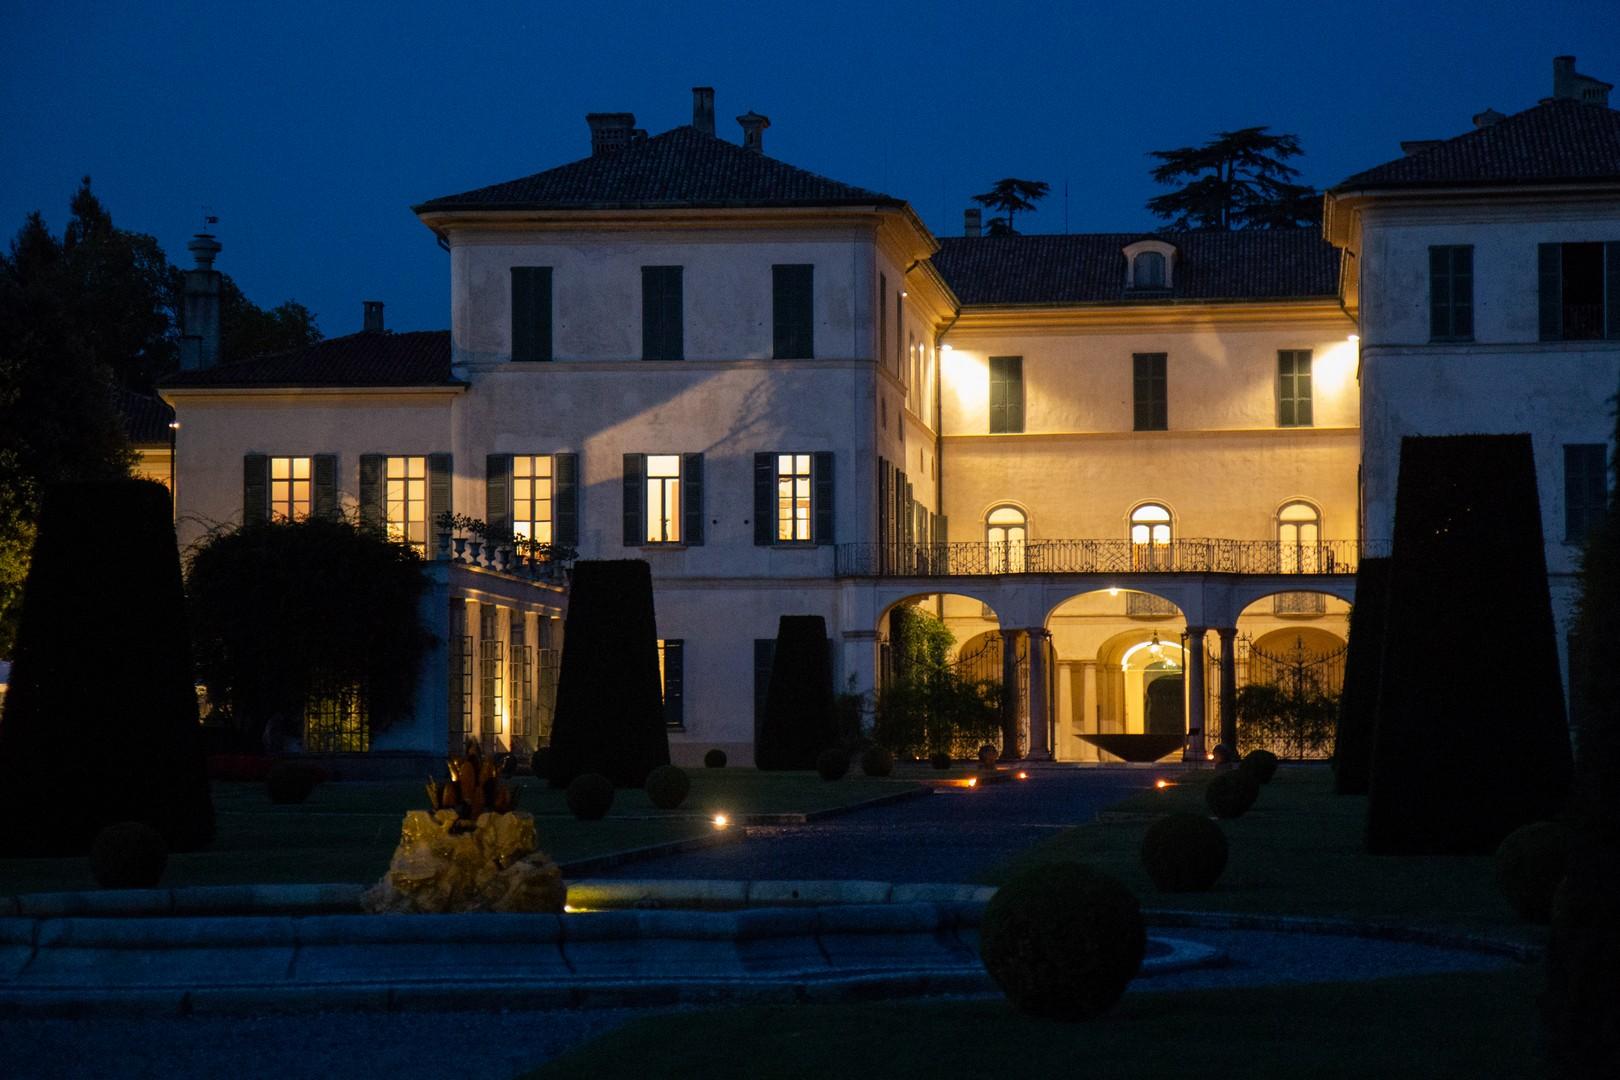 Villa Panza Varese / Viola Azzolin